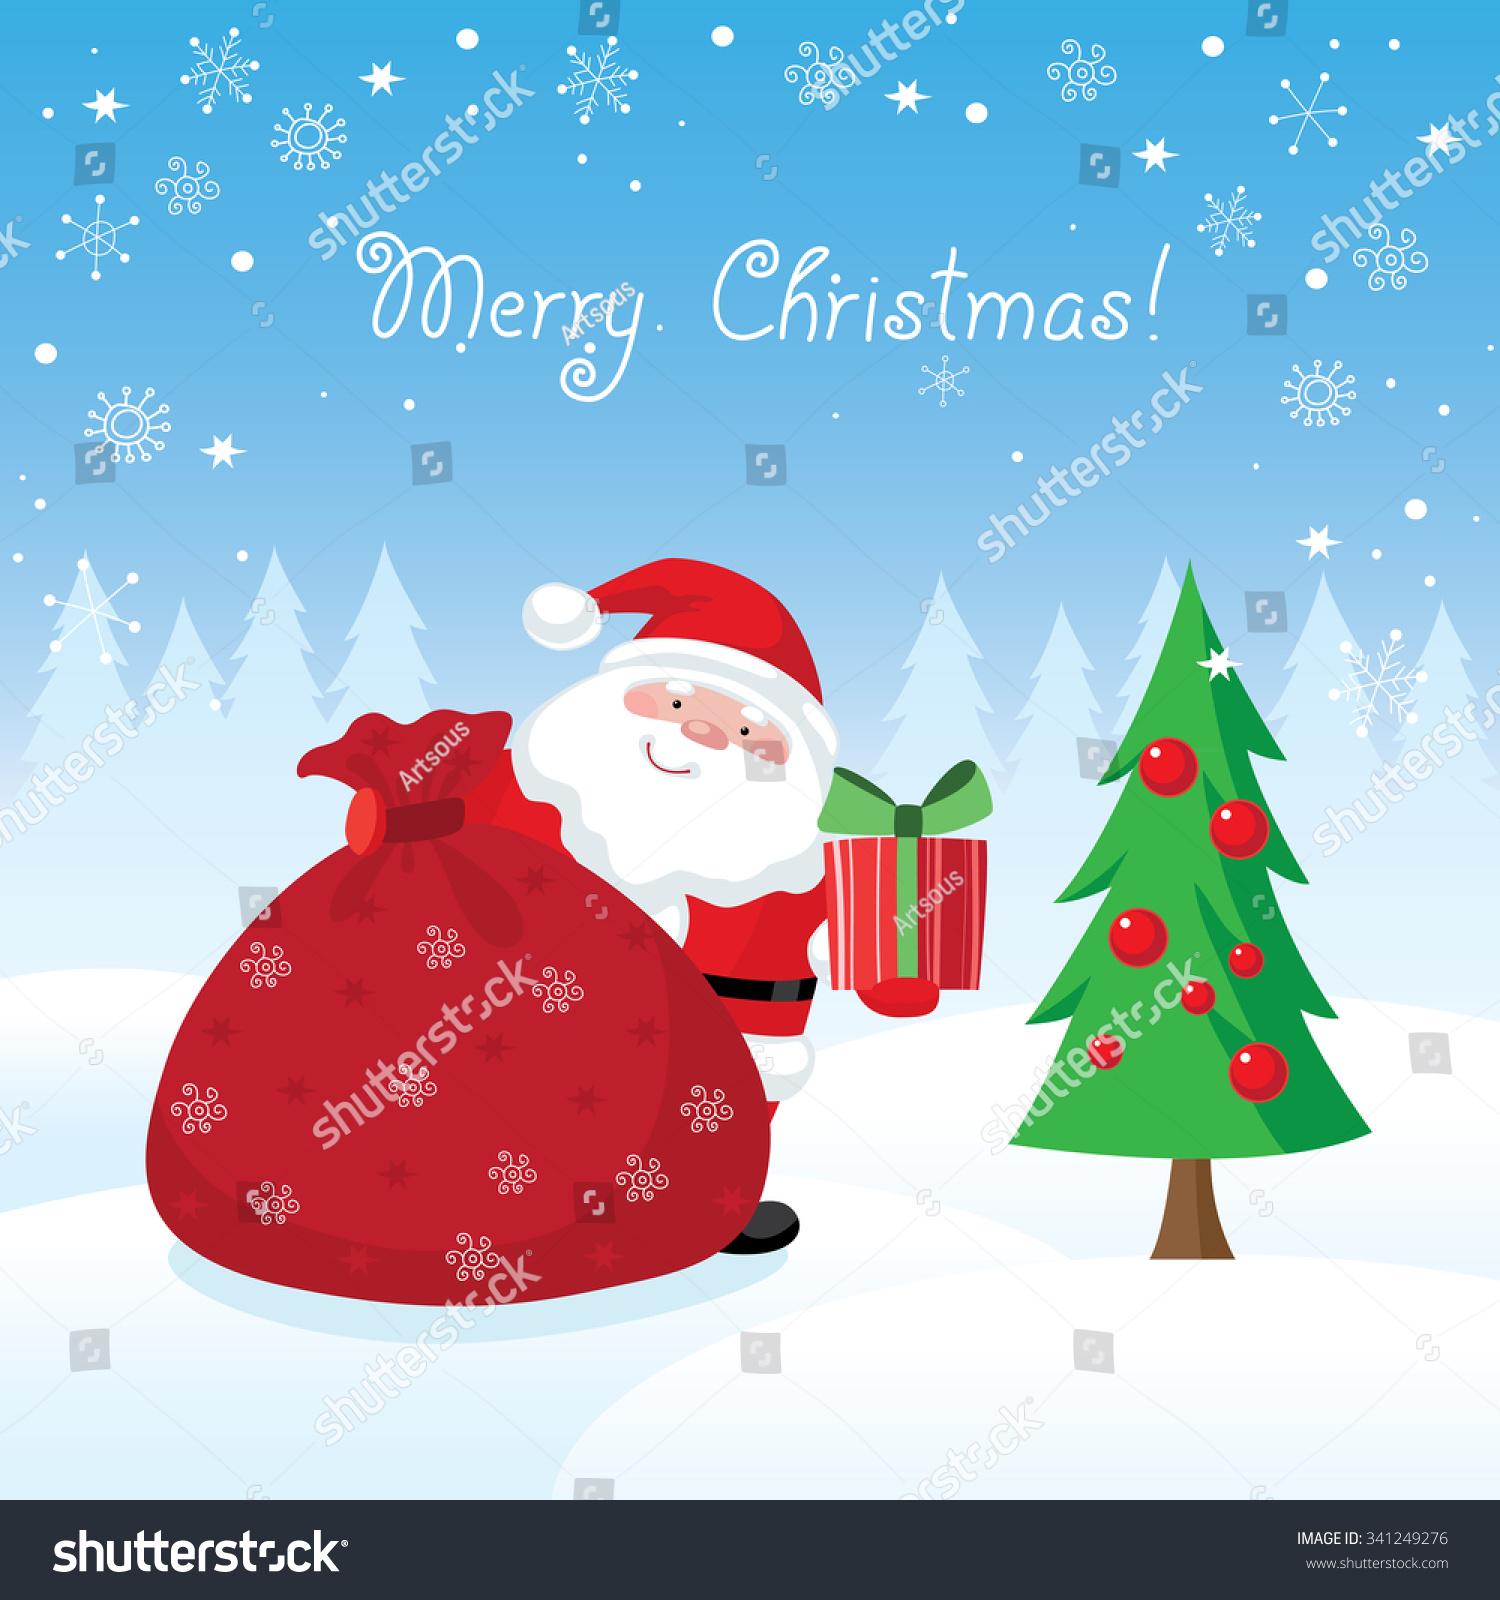 Christmas Card Santa Claus Holding Gift Stock Vector (Royalty Free ...